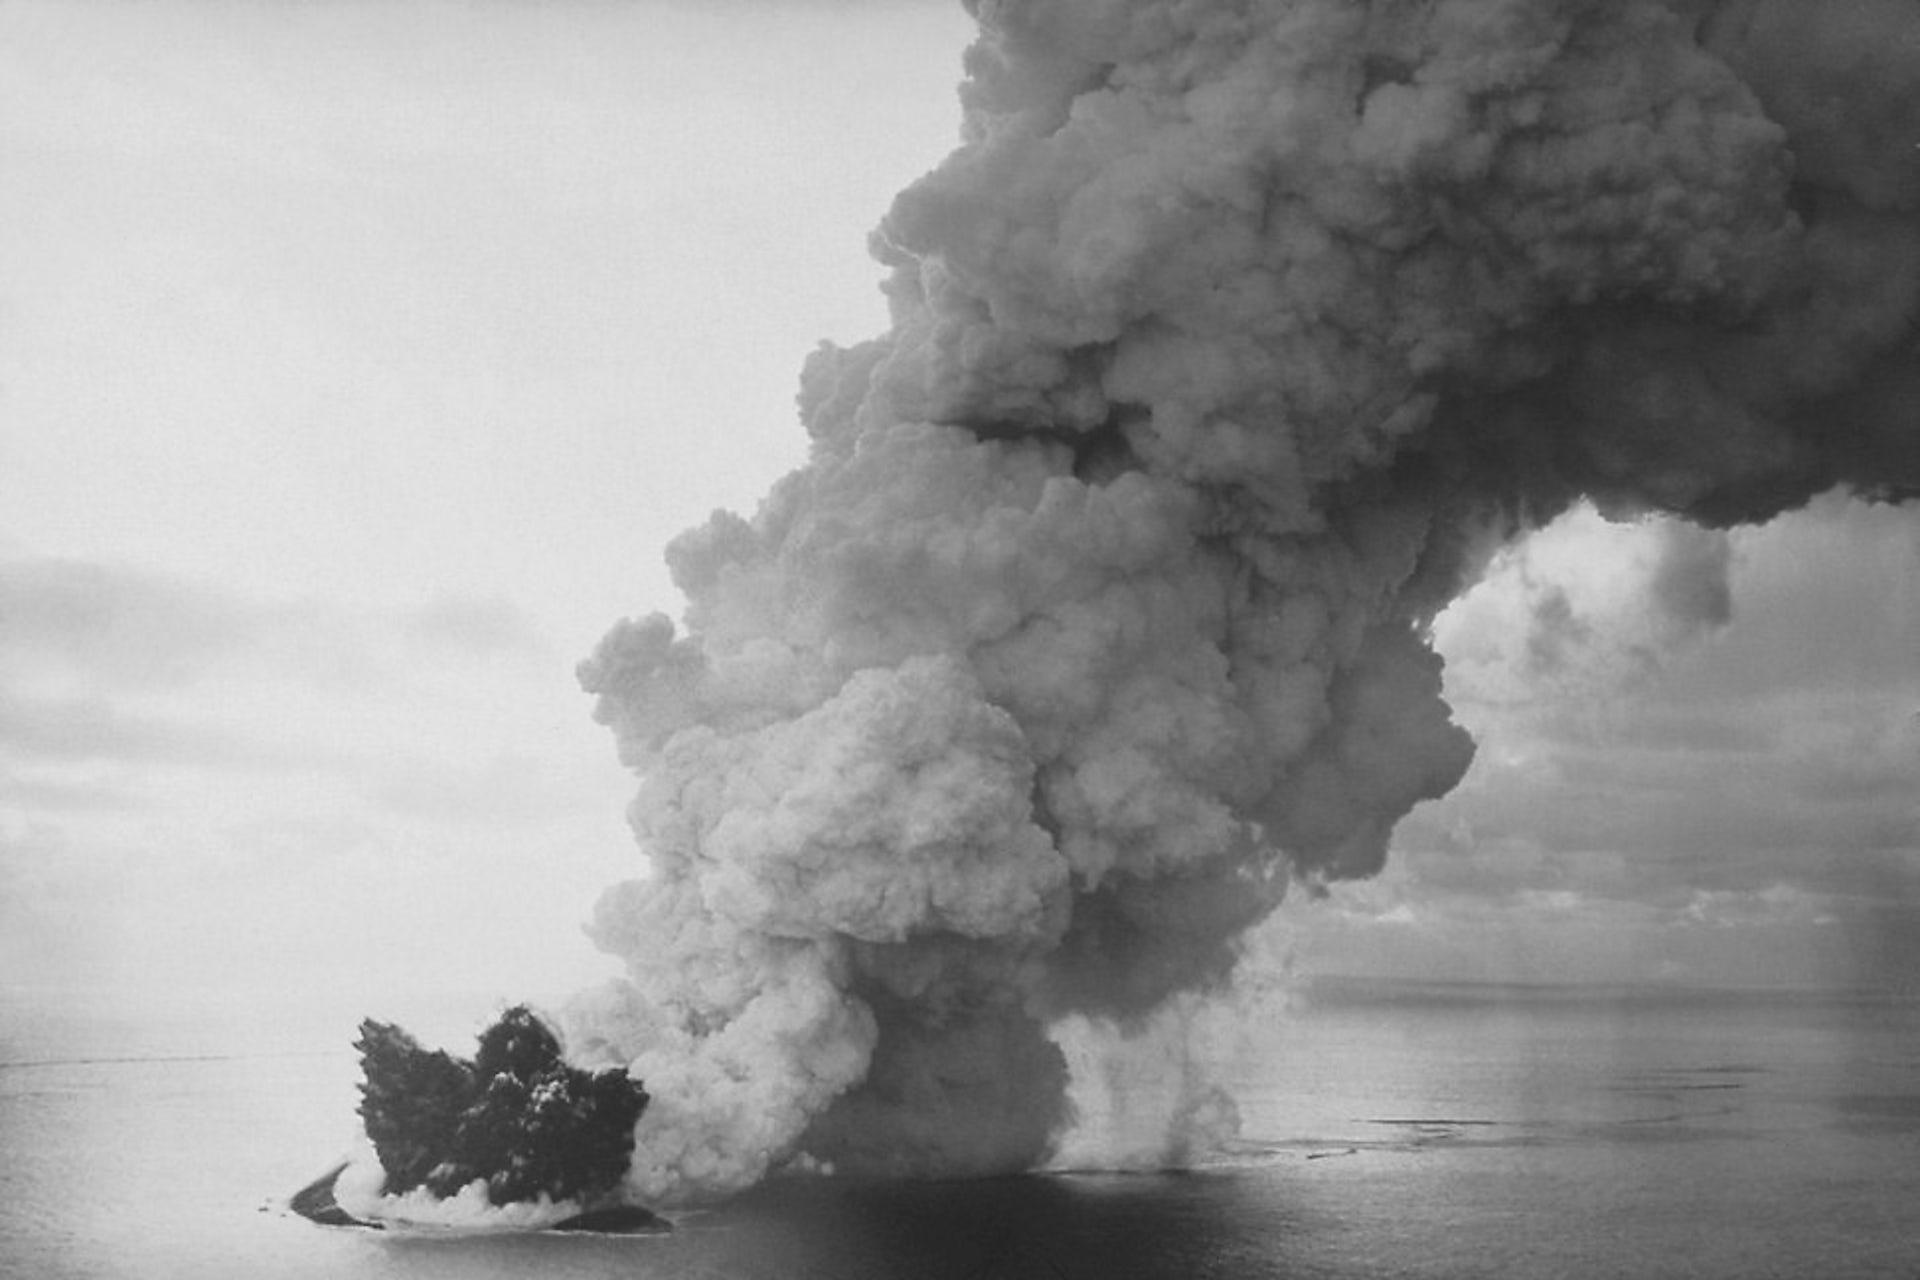 Erupción submarina en Surtsey, Islandia, en 1963. Wikimedia Commons / NOAA